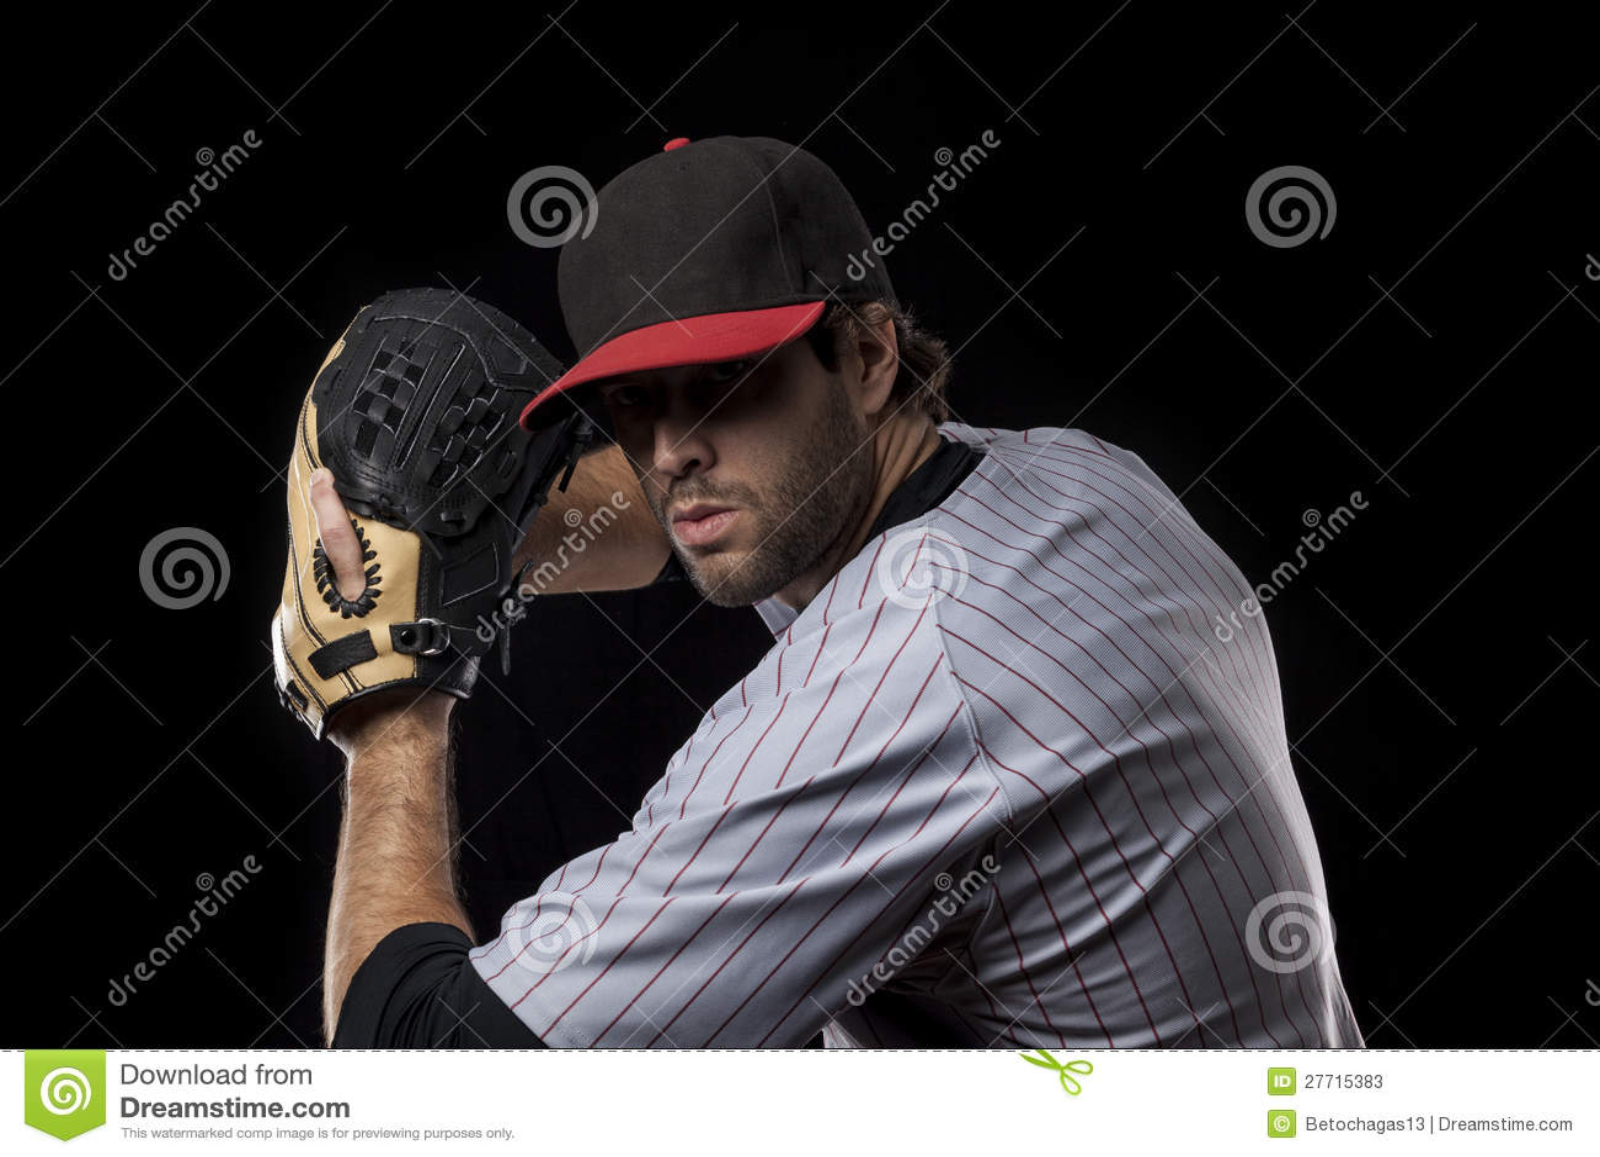 Jugador De Béisbol En Un Uniforme Rojo. Imagen de archivo - Imagen ... 3b48cd83469